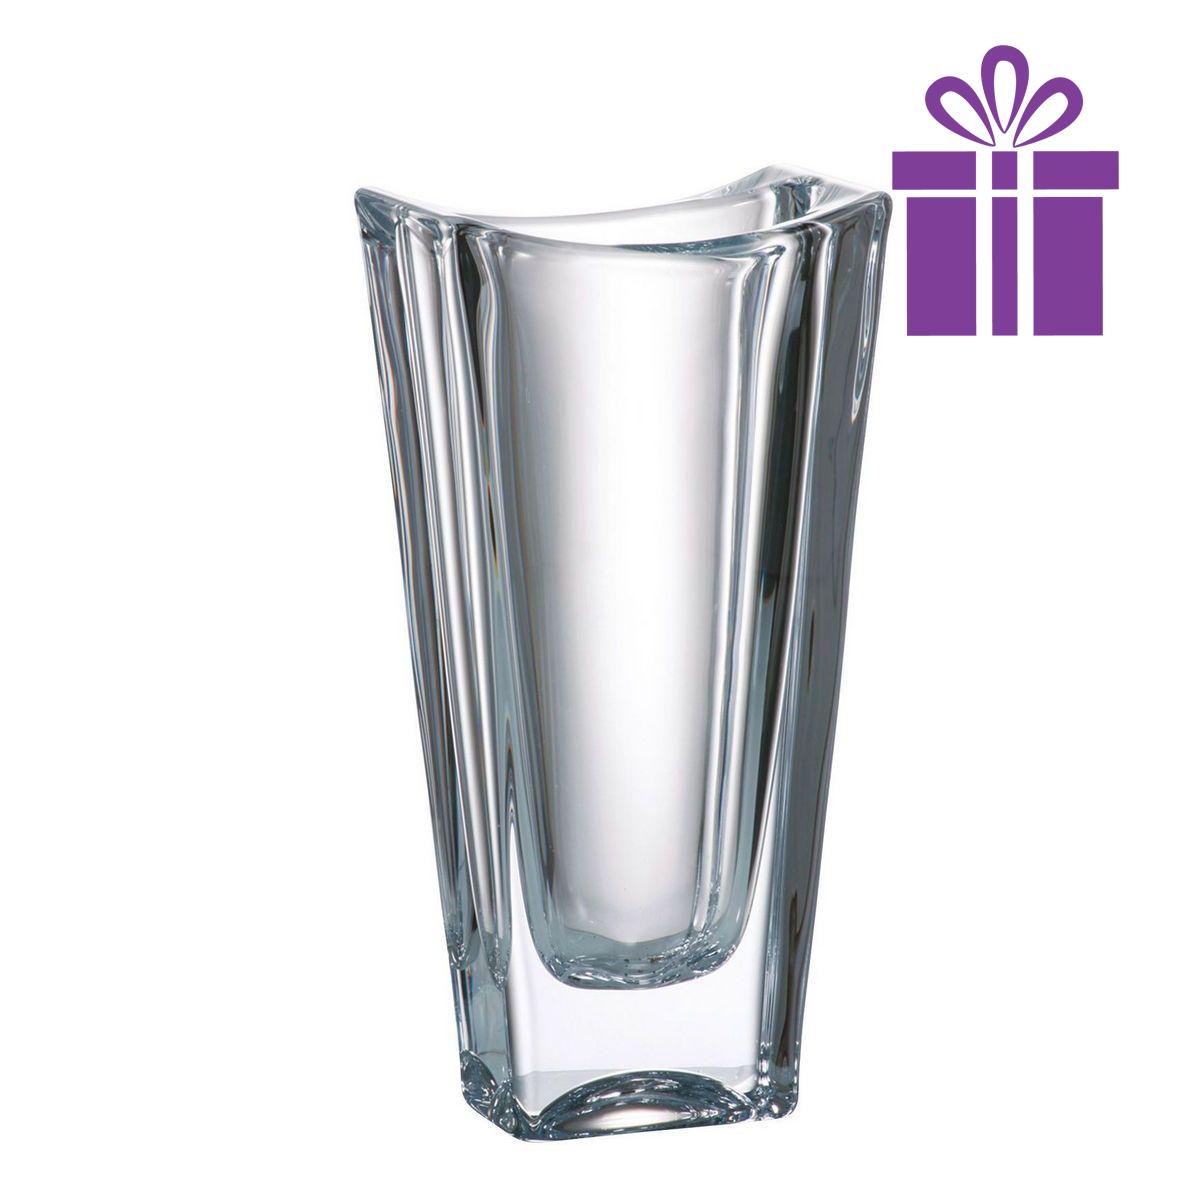 Okinawa Vaza Cristalin 30 Cm 2021 aranjareamesei.ro